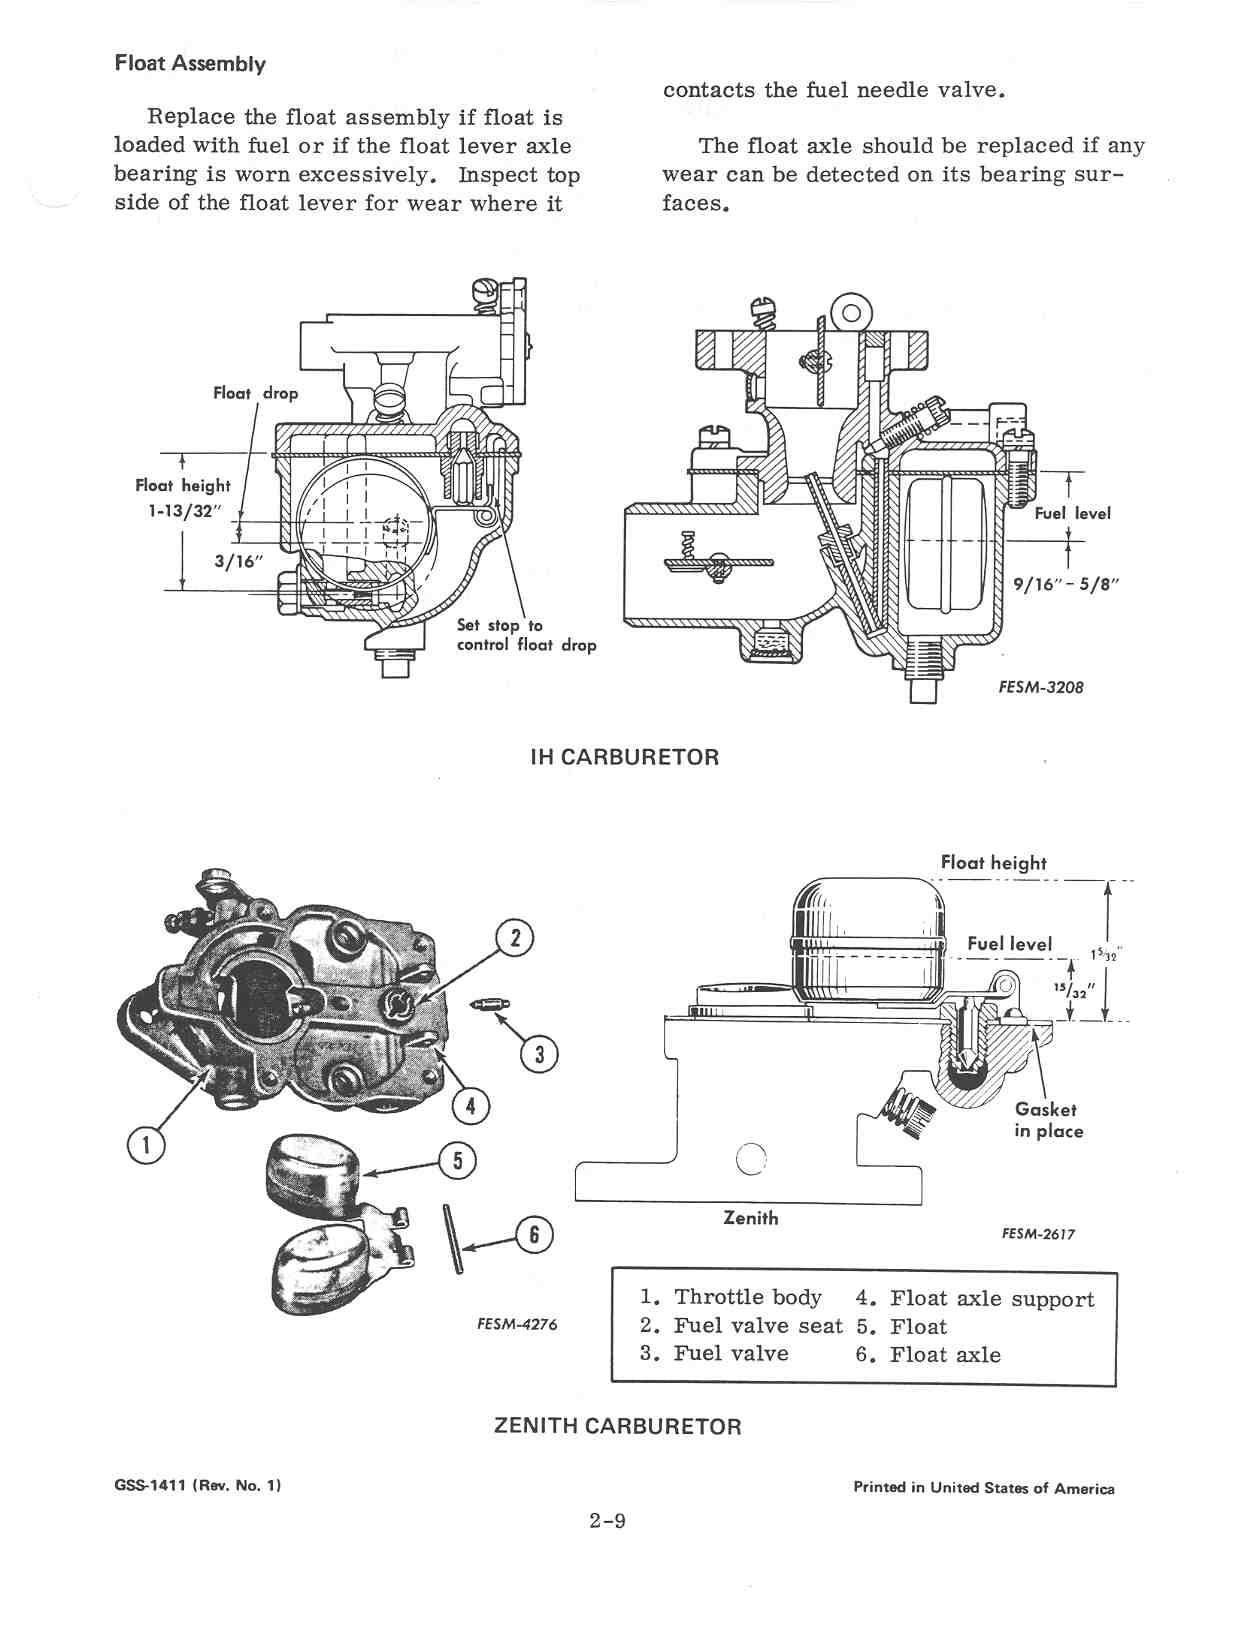 Farmall Super H Carburetor Diagram - Wiring Diagram & Cable ... on